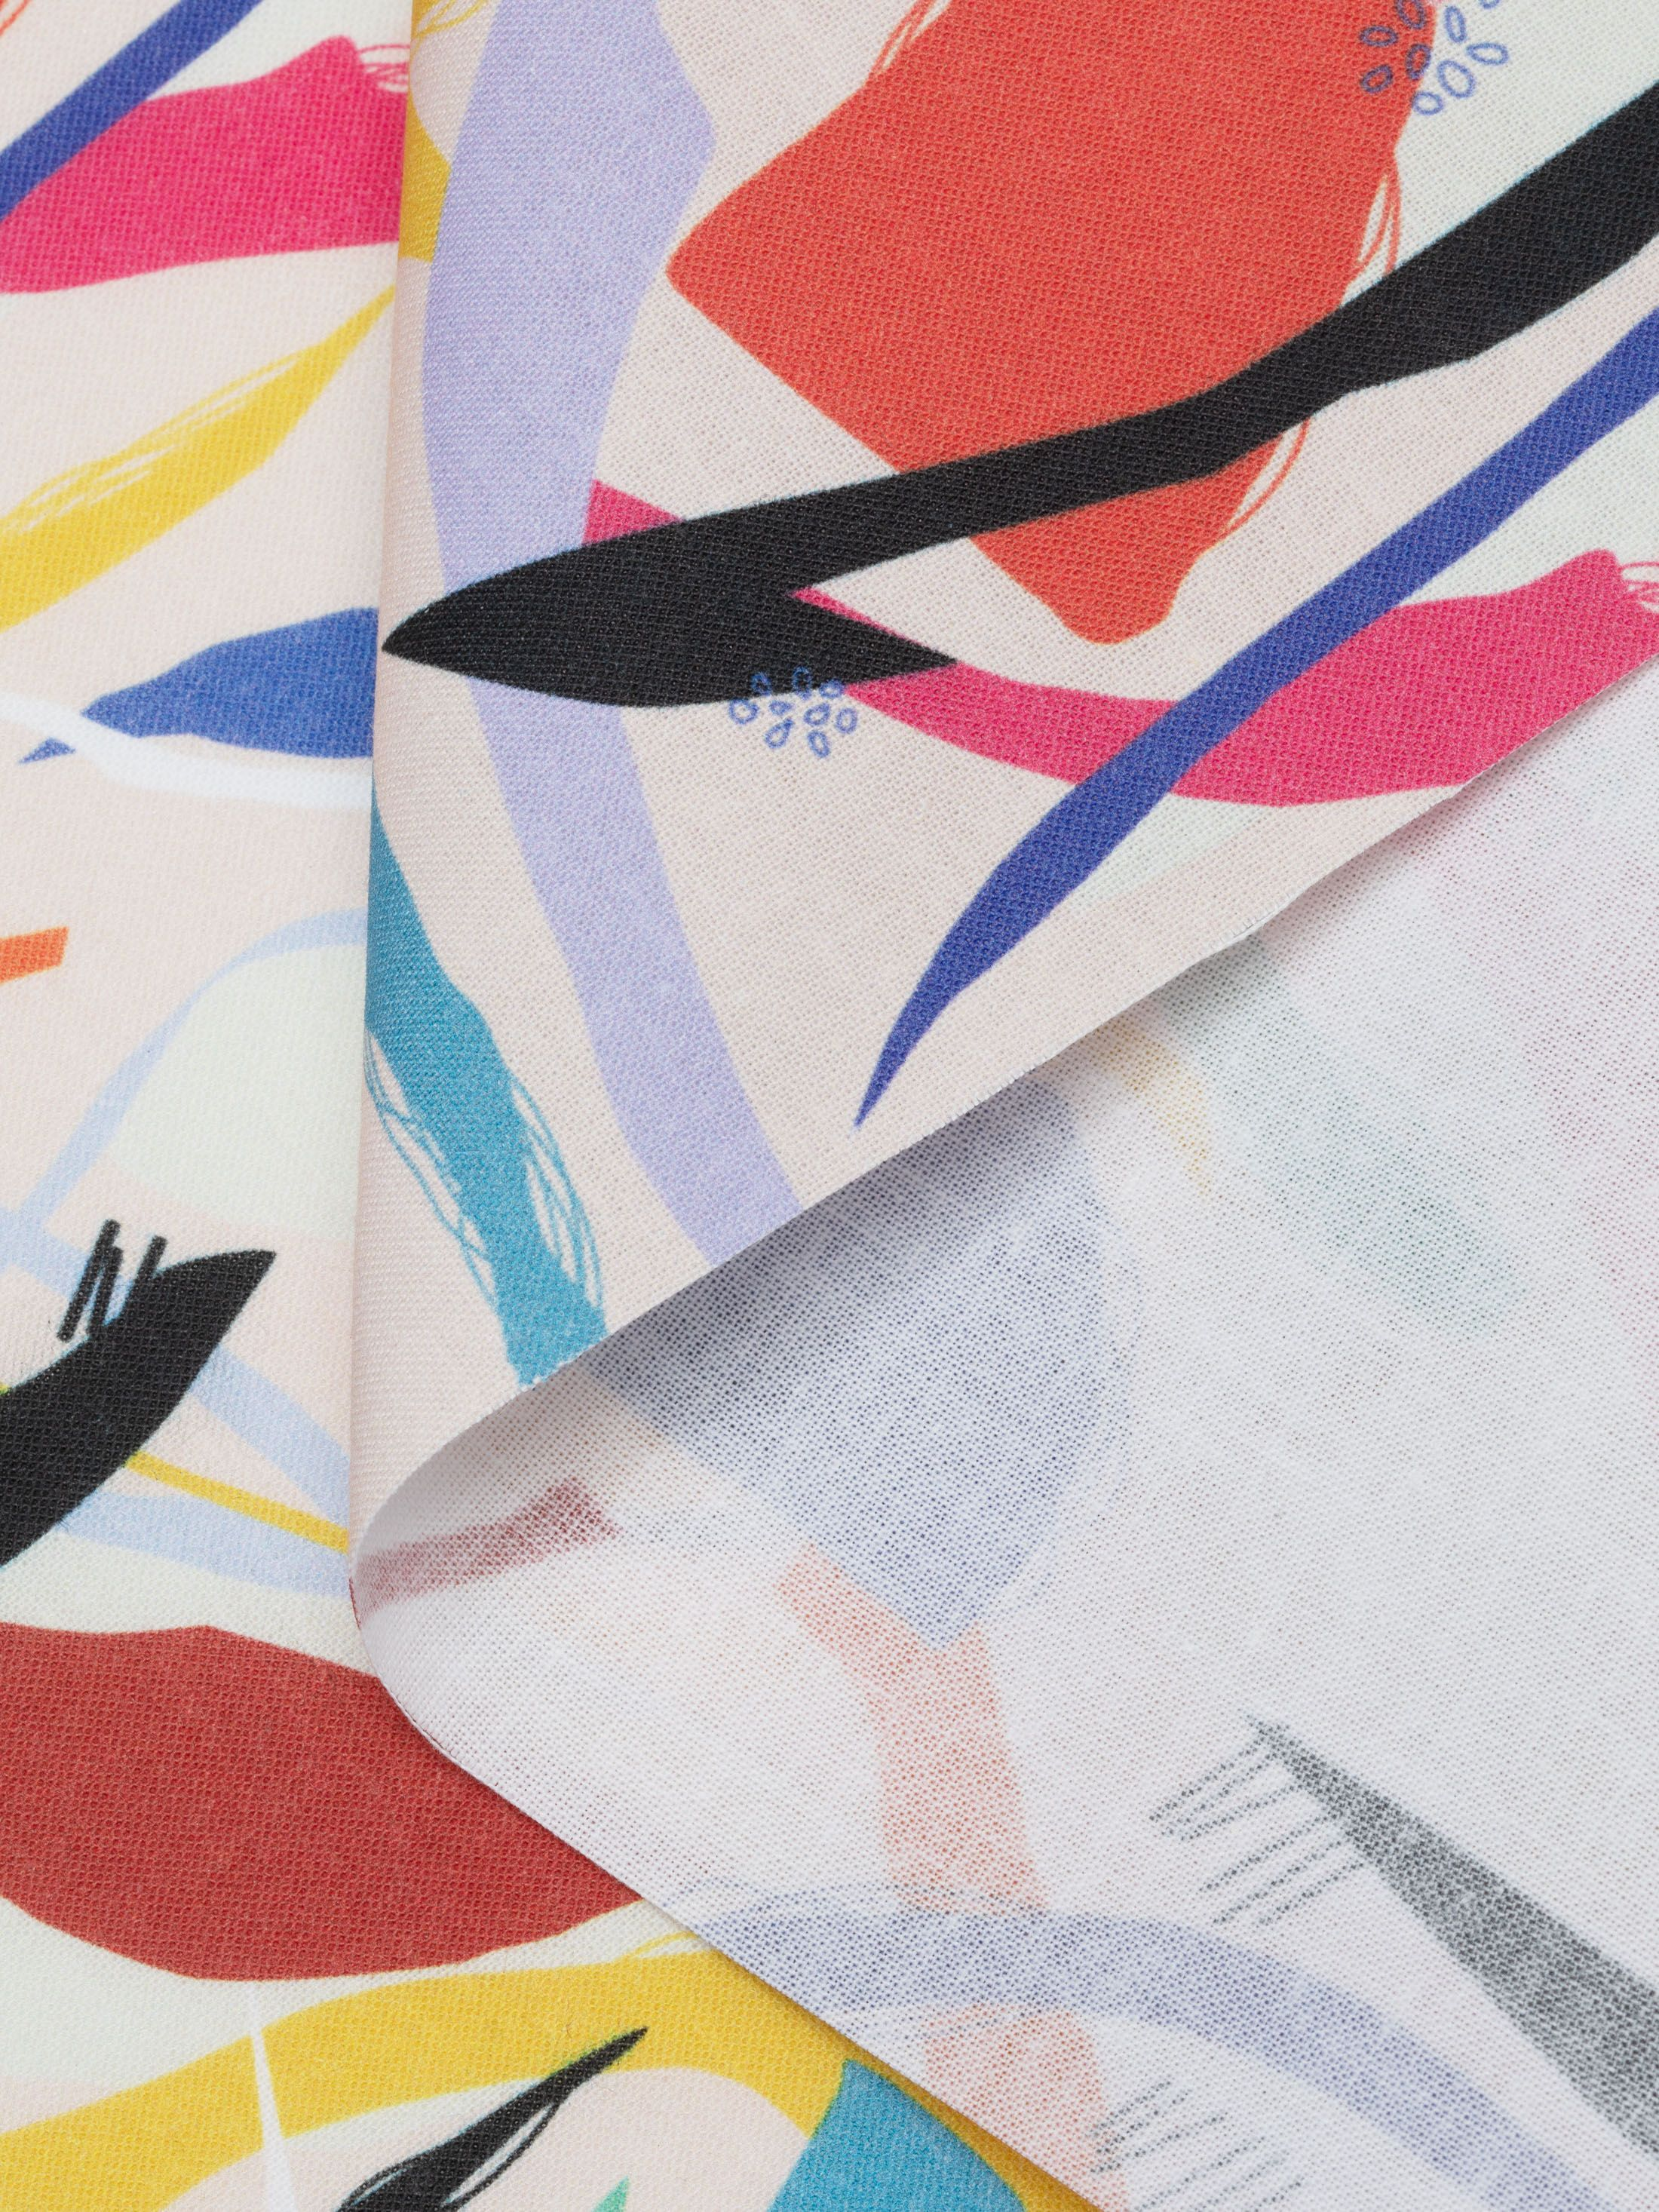 Calico Cotton print your own design